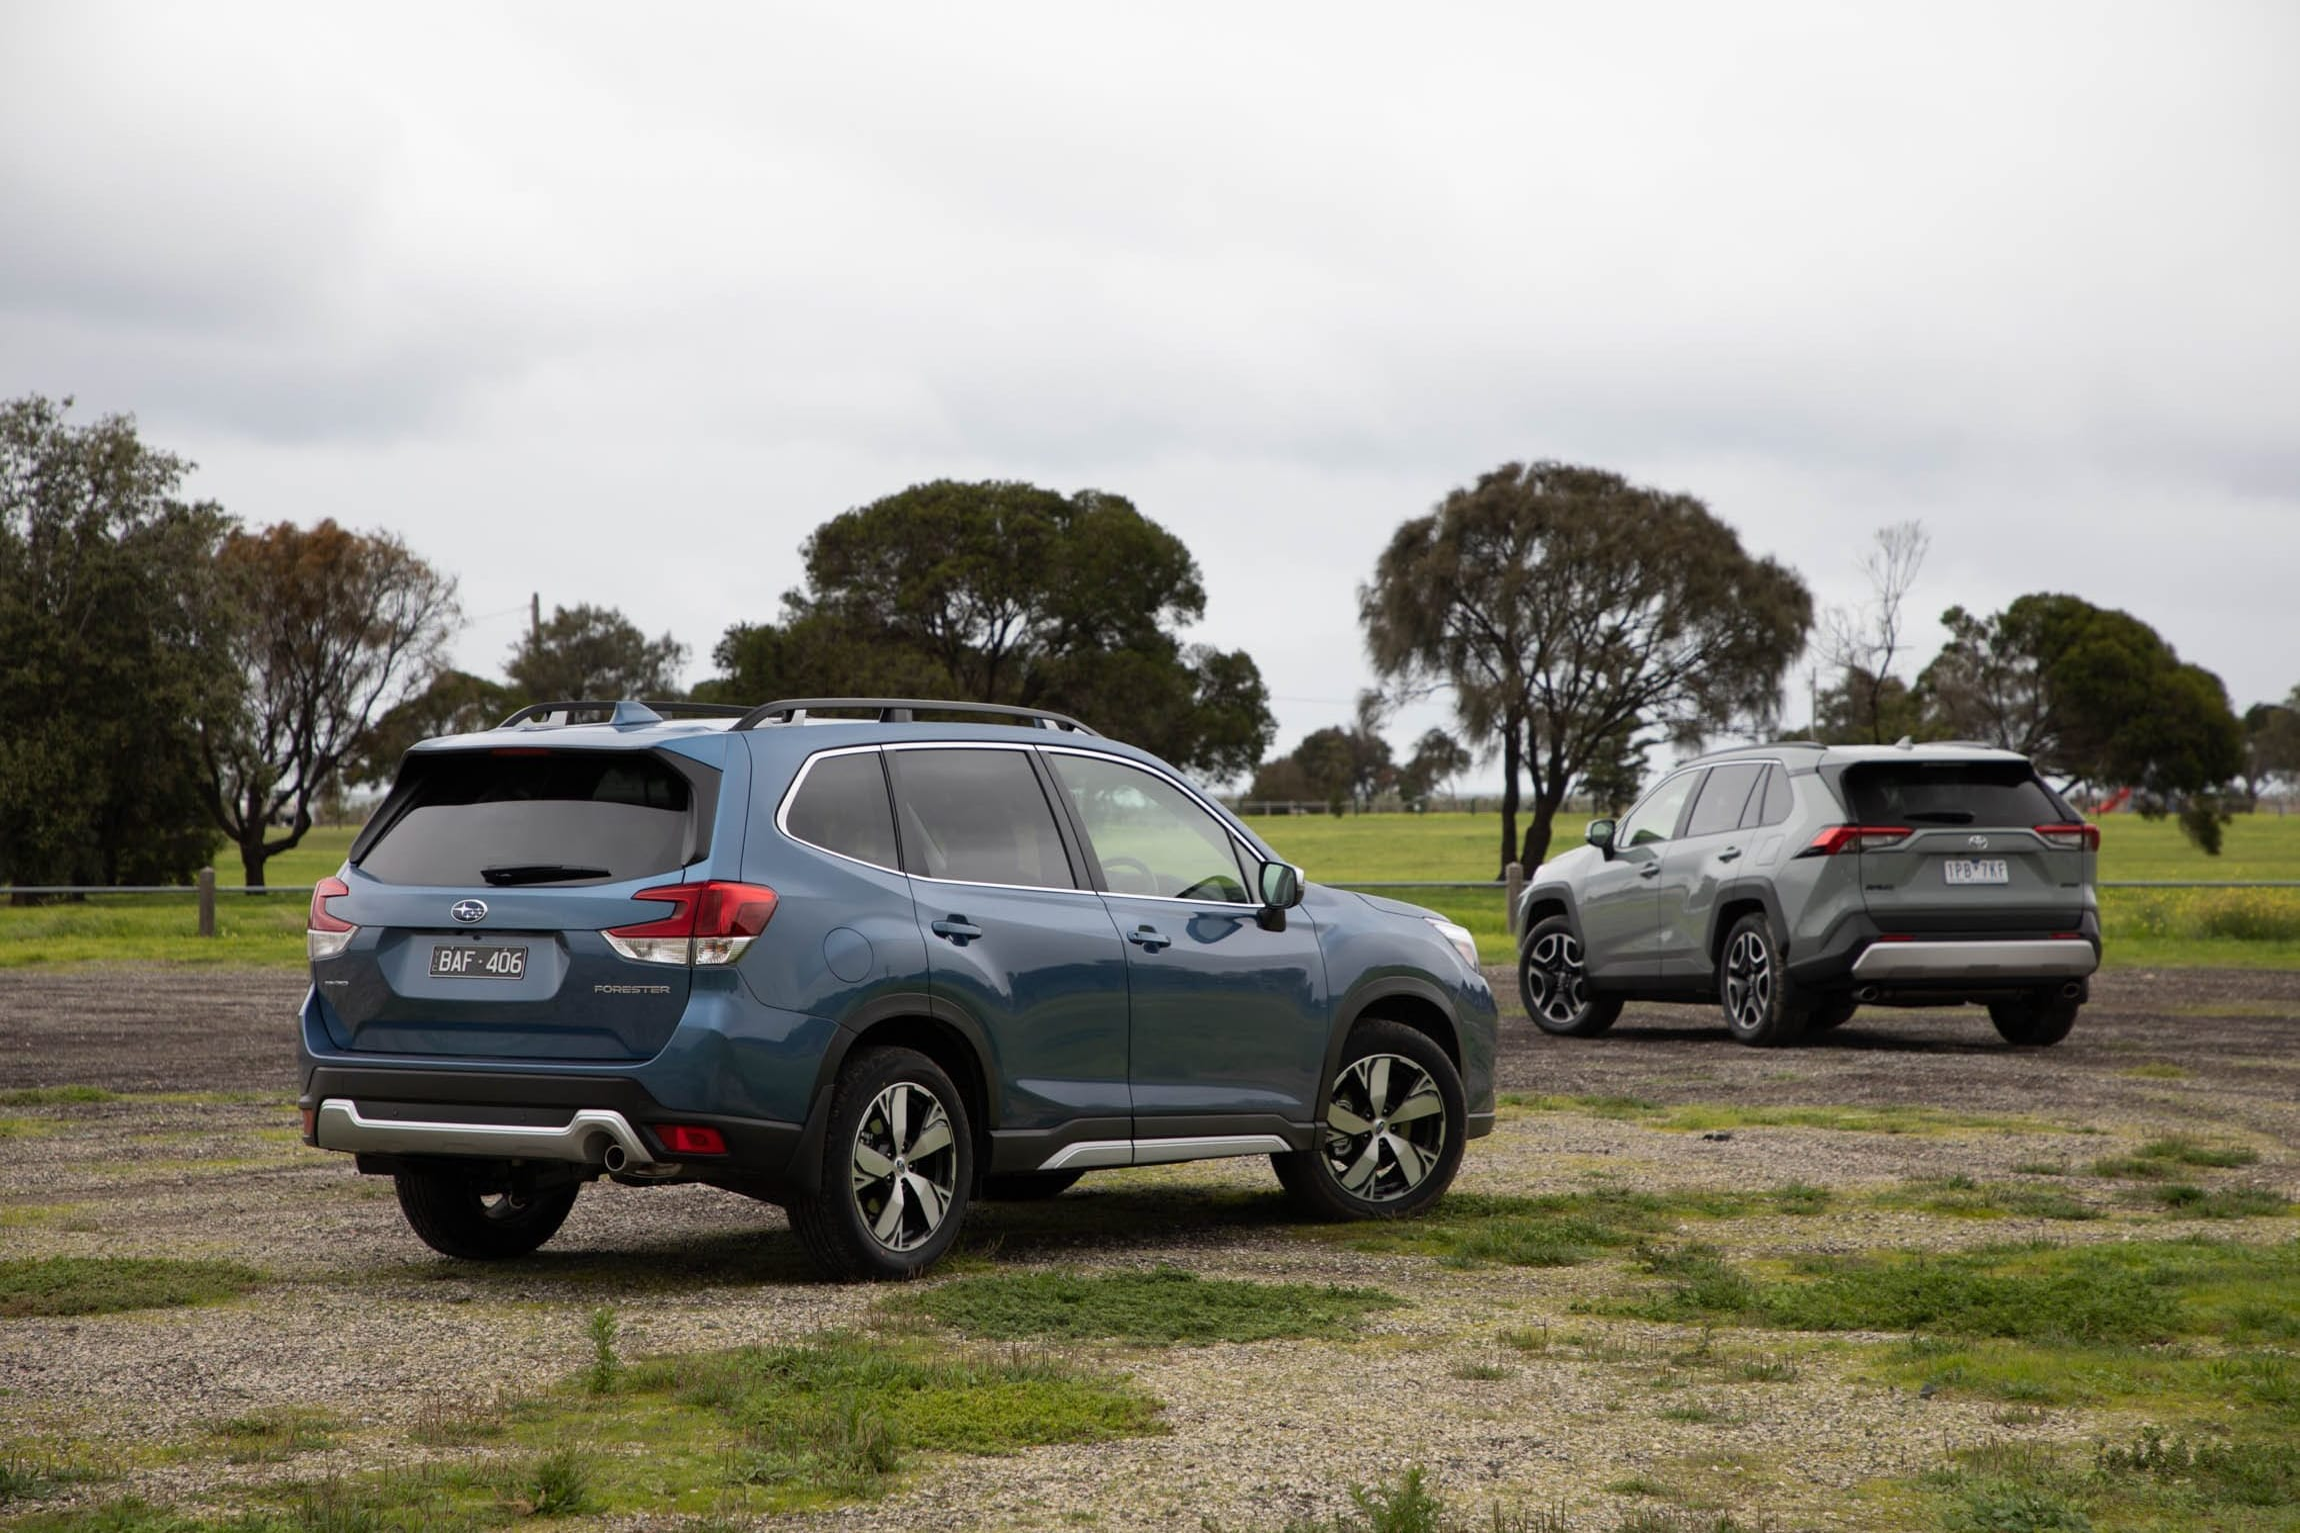 2019 Toyota Rav 4 Vs Subaru Forester Comparison 4 Jpg